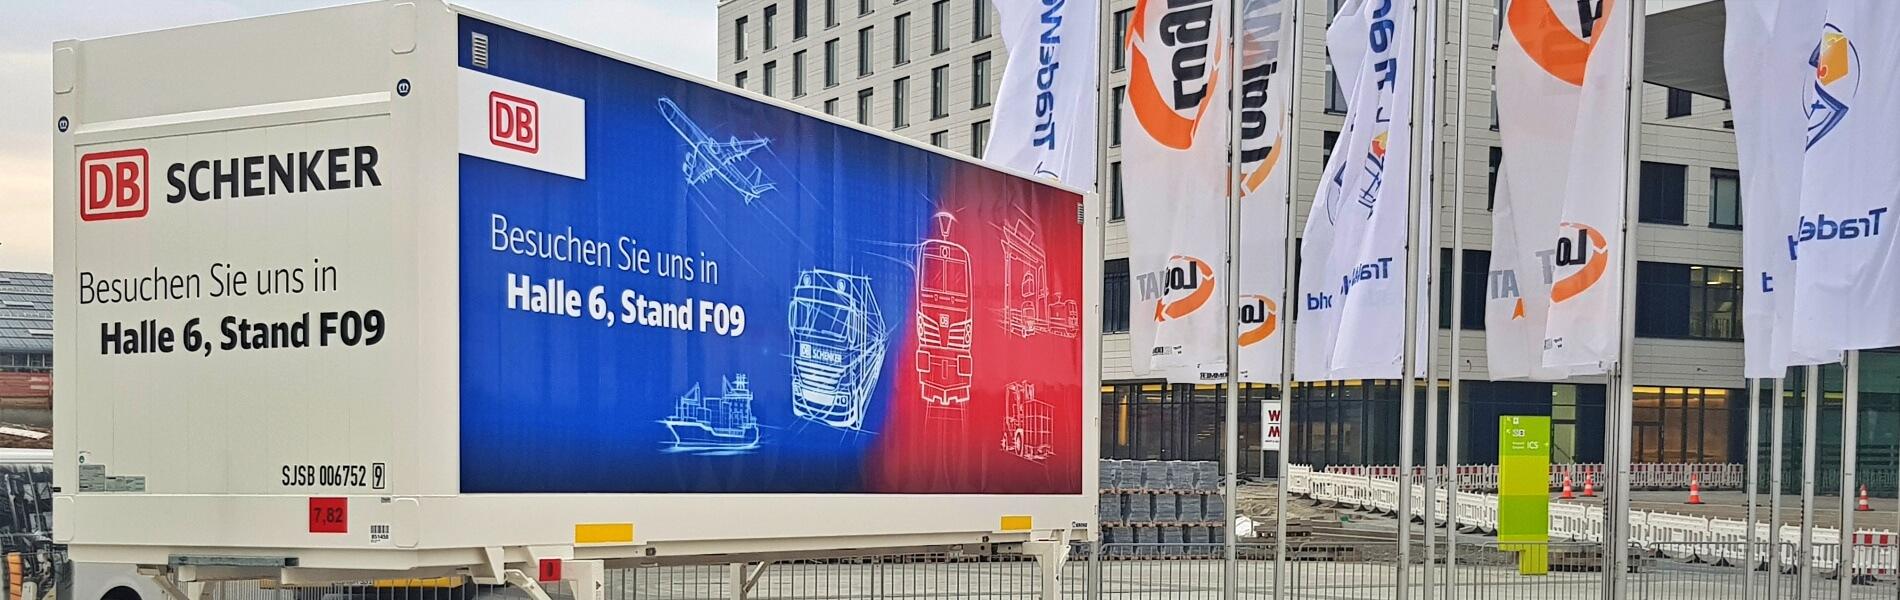 An industry undergoing digital transformation – DB Schenker at LogiMAT 2019